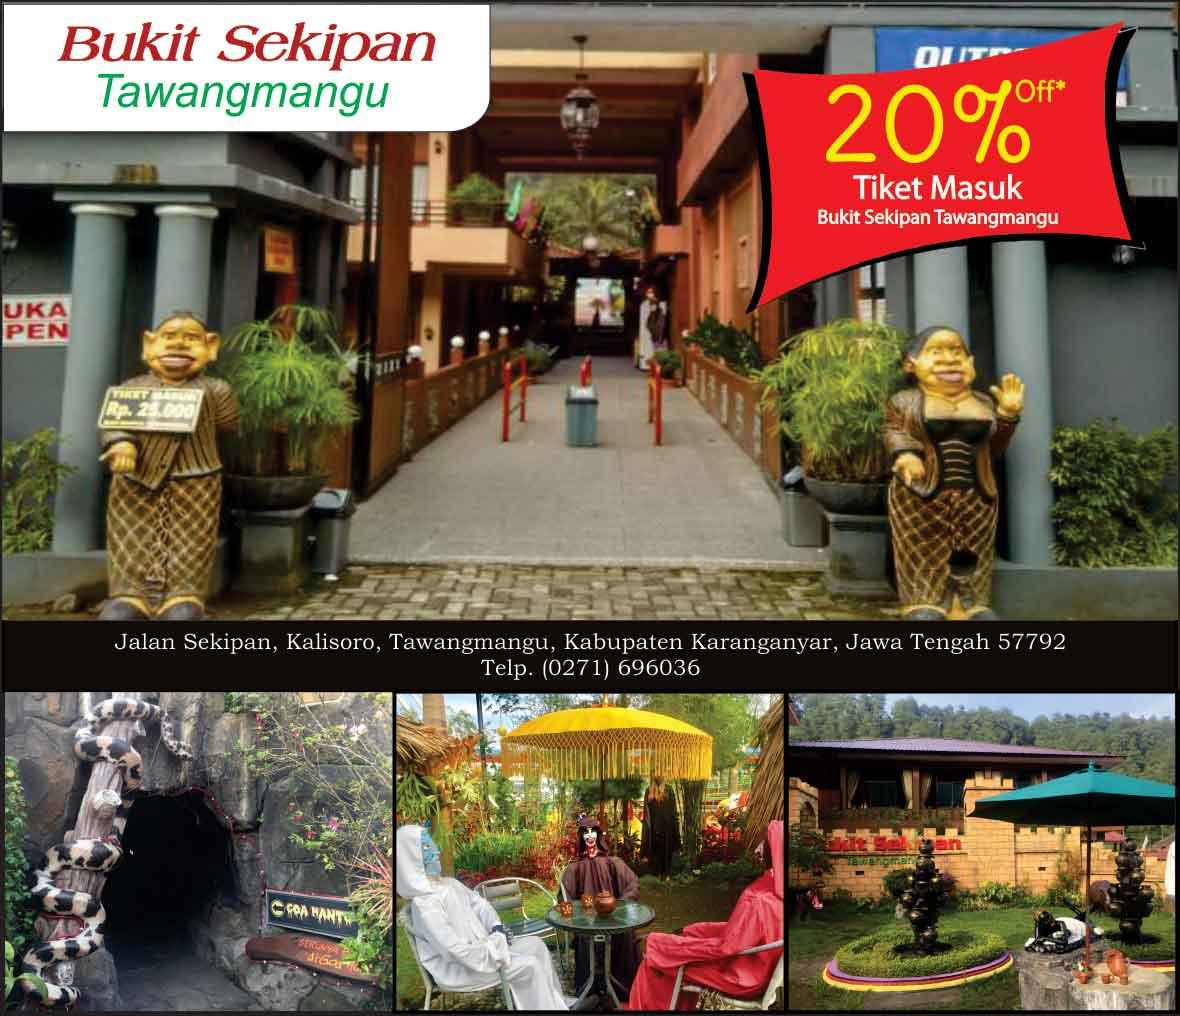 Travelcare Indonesia Wisata Bukit Sekipan Kab Karanganyar